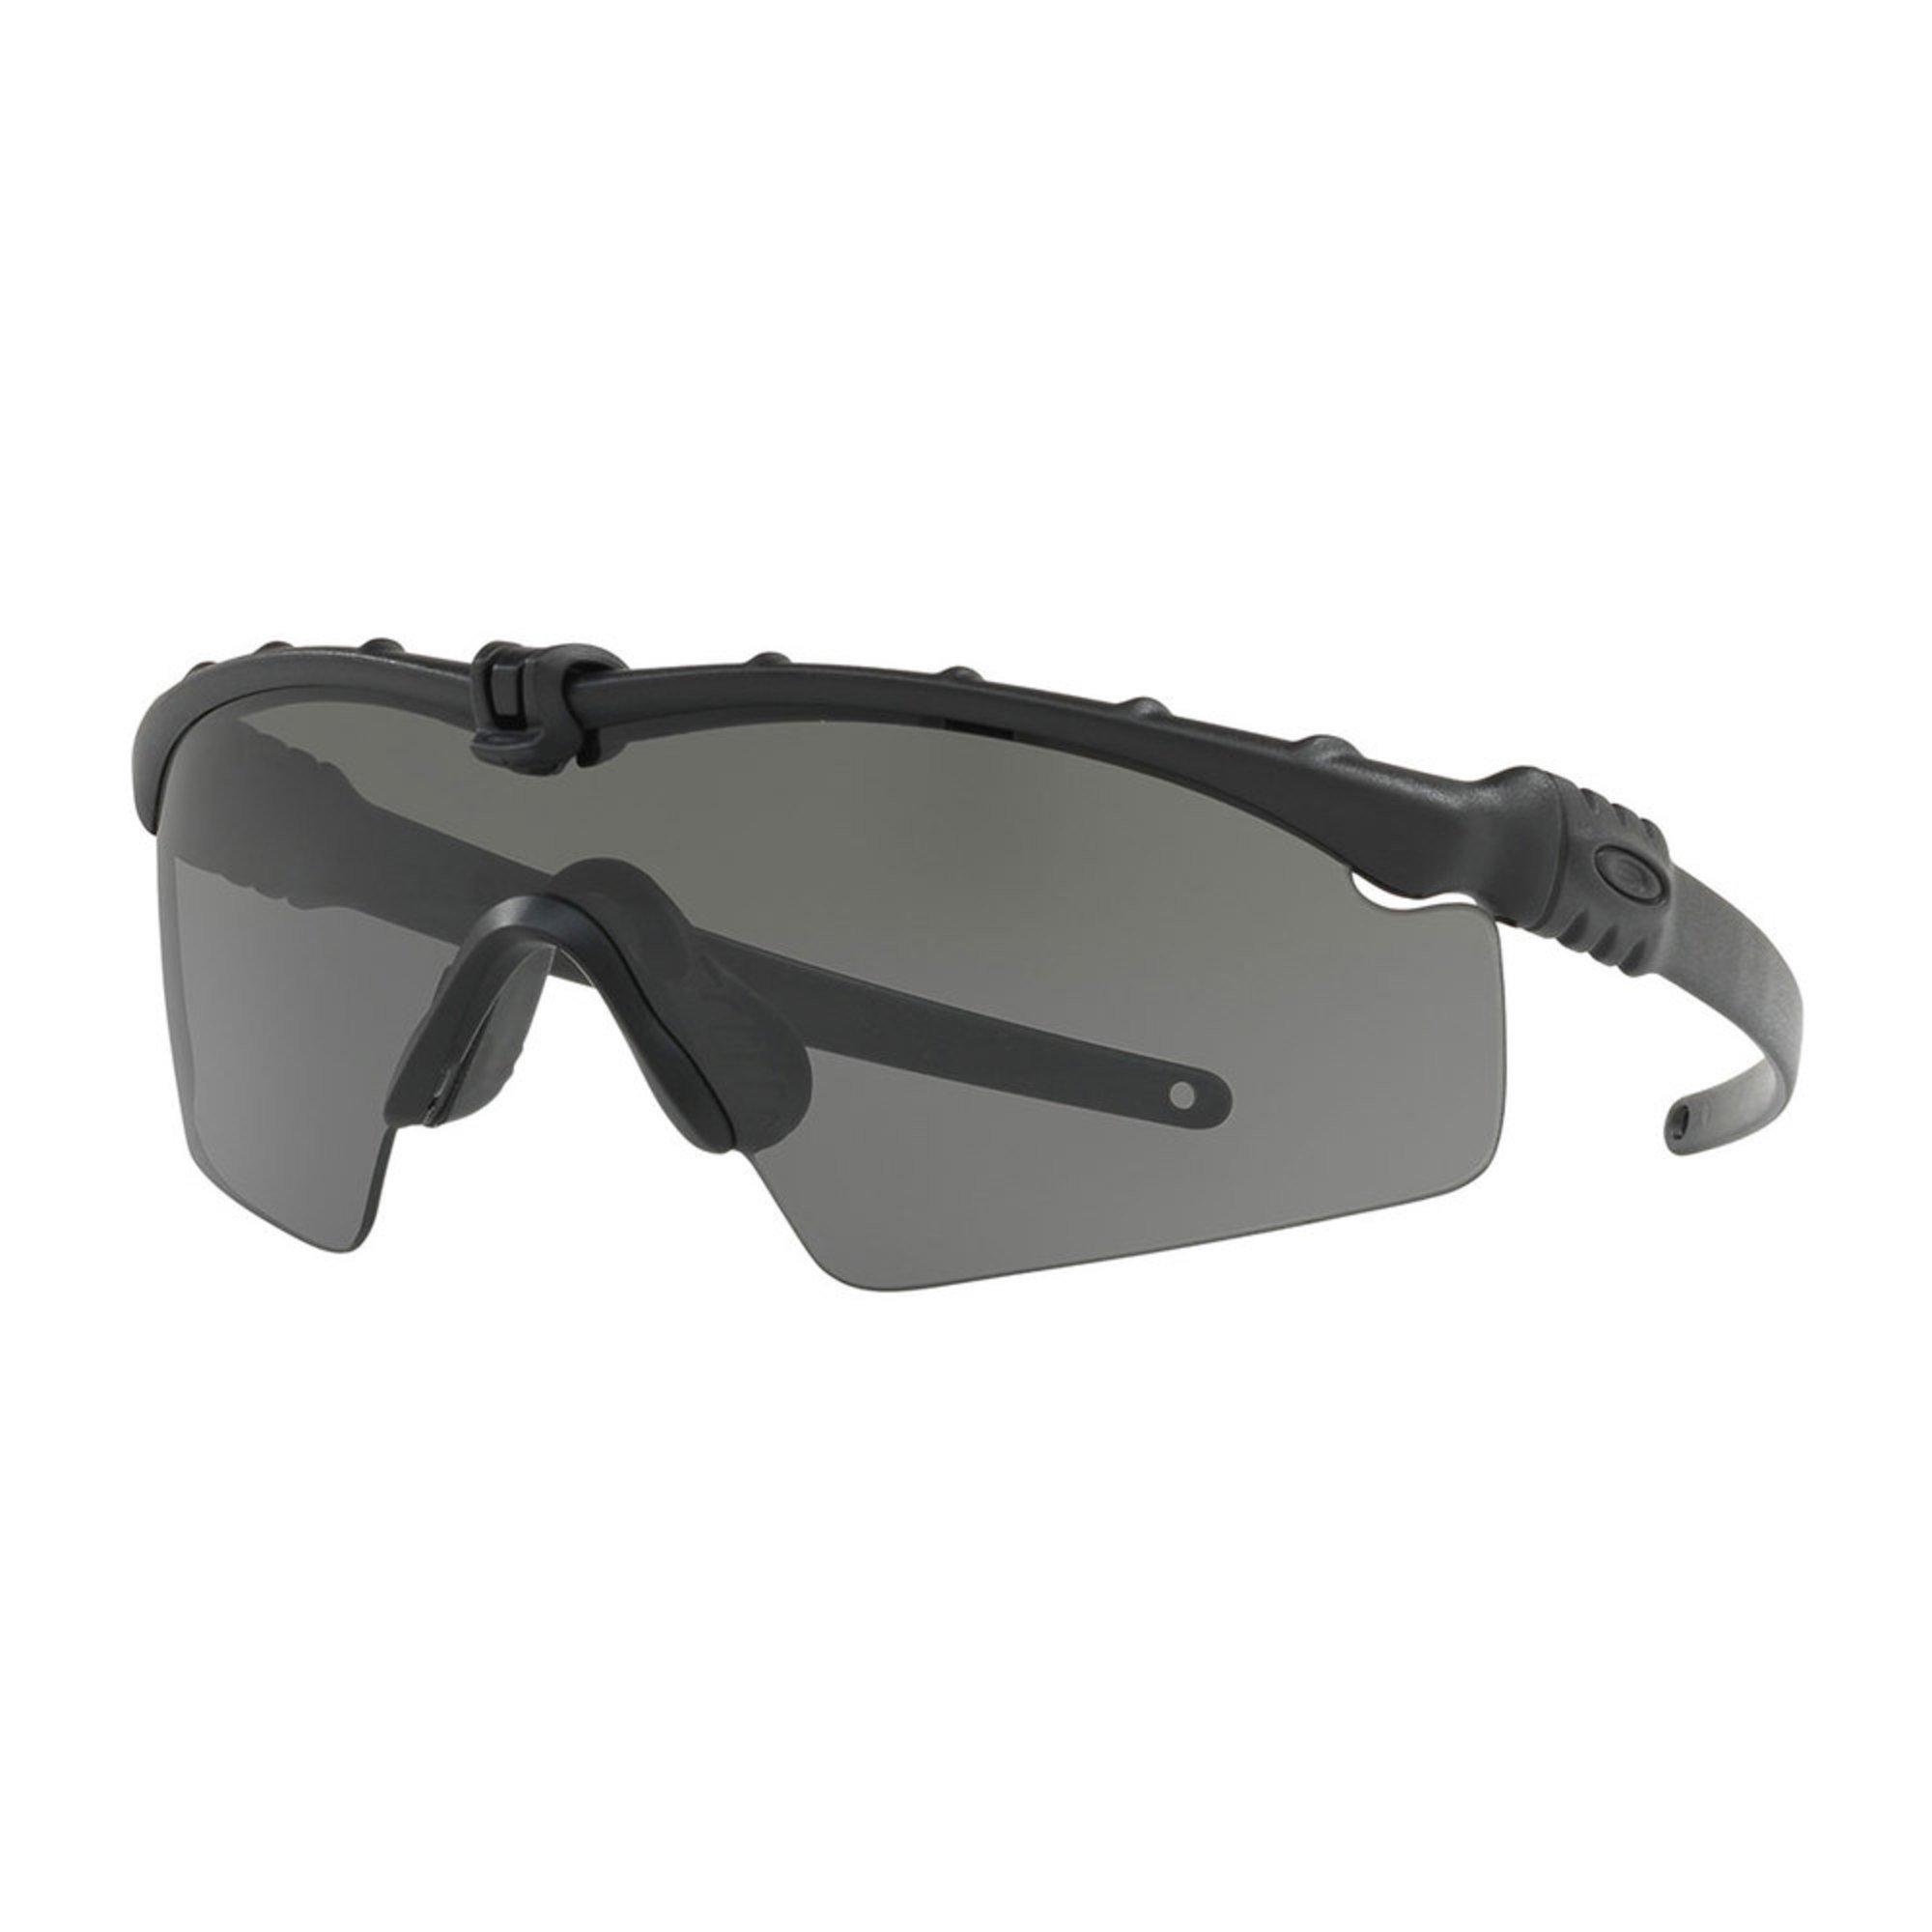 ef22f7cce7e31 Oakley. Oakley Men s Ballistic Wrap Sunglasses